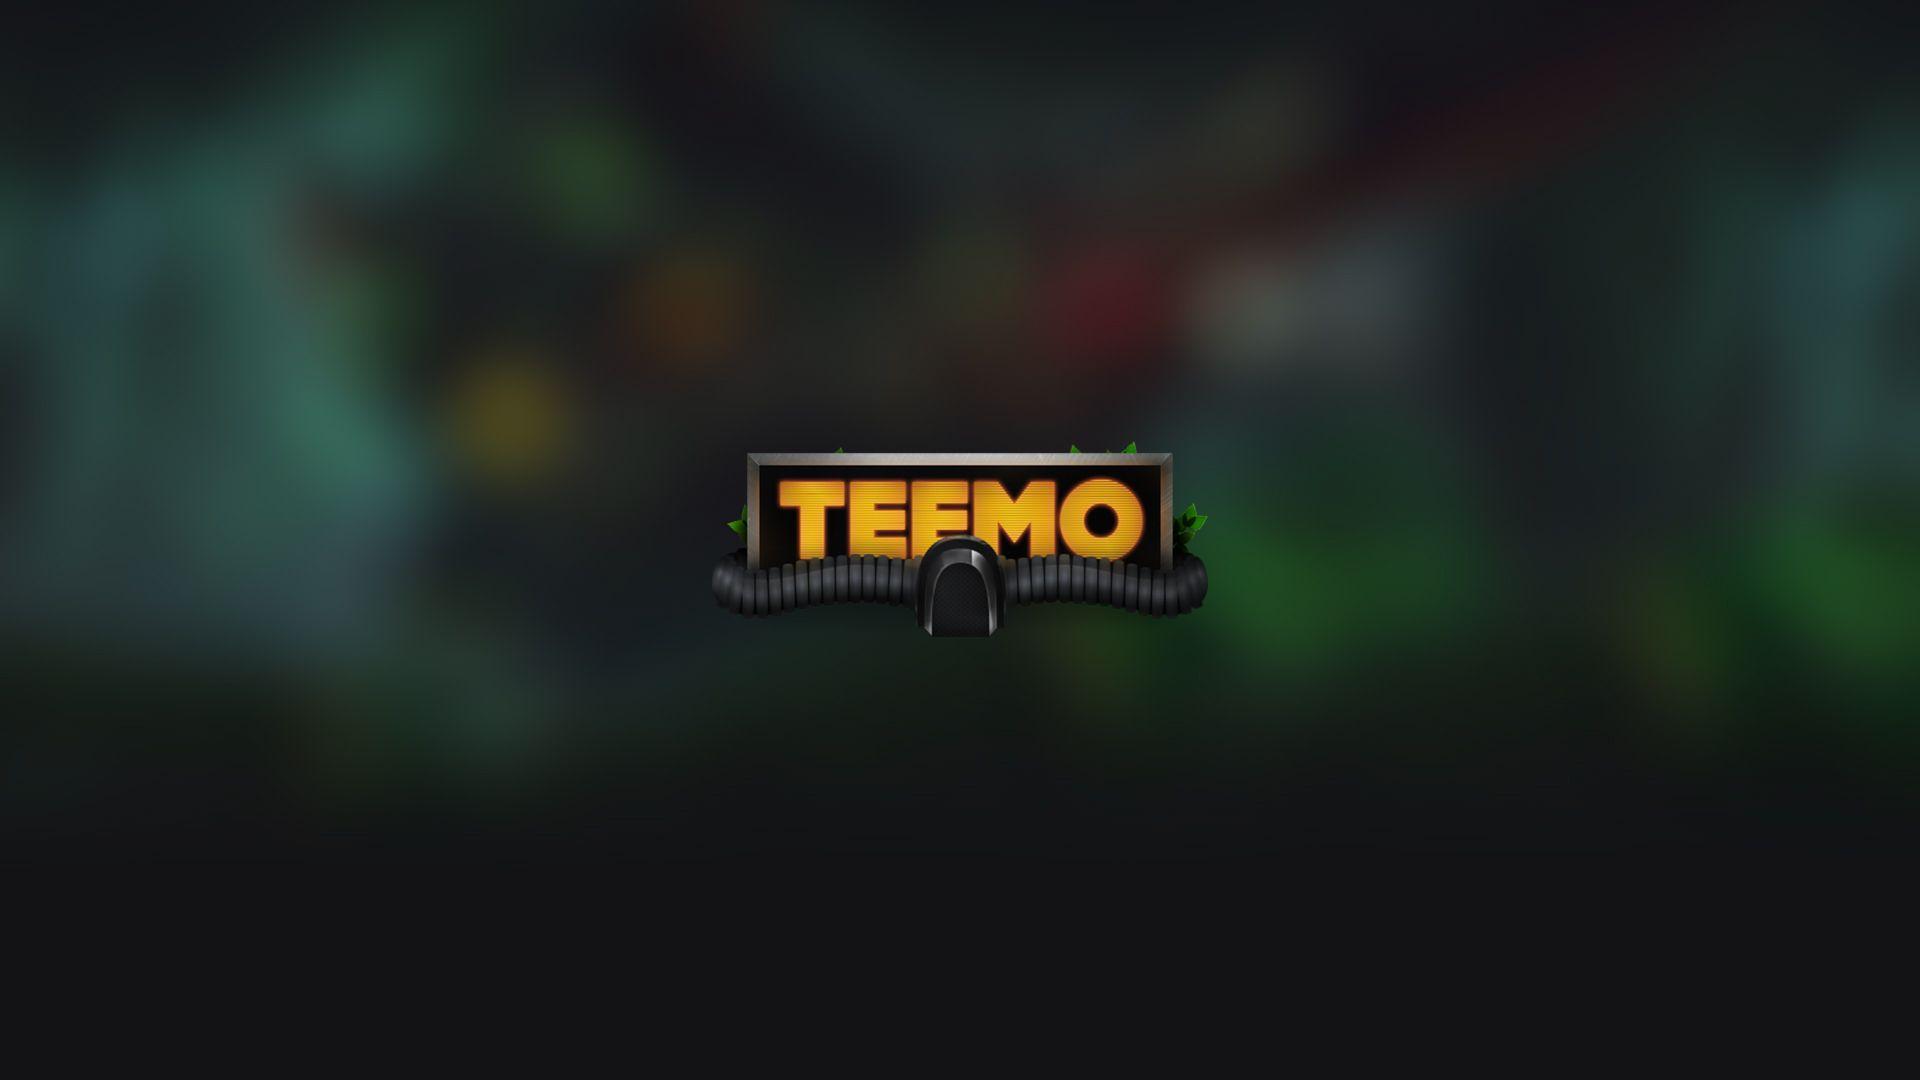 Teemo bg